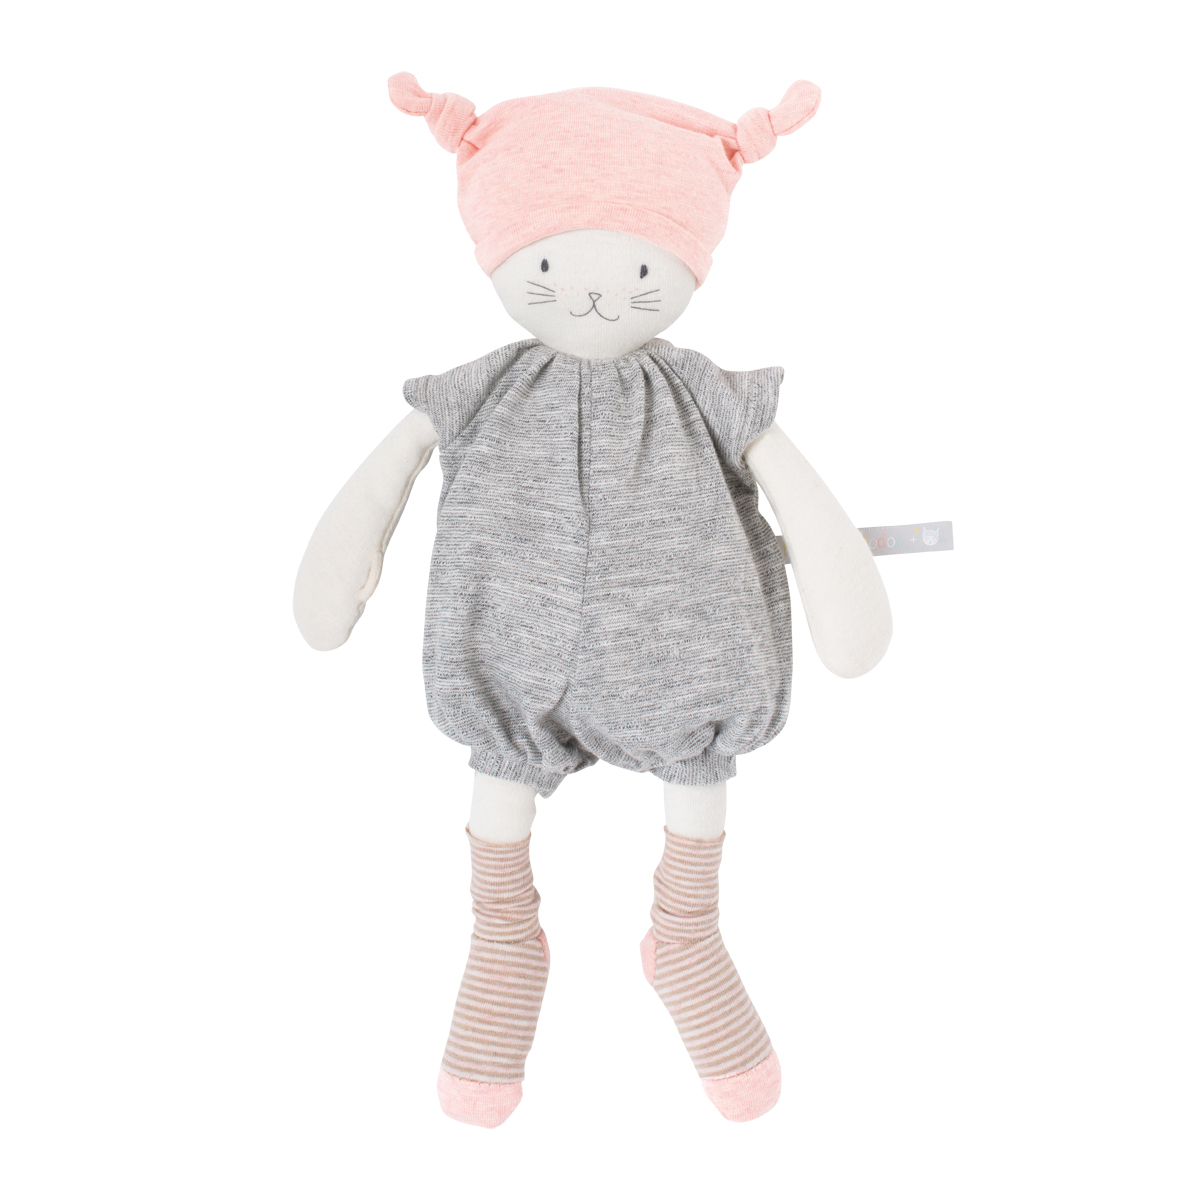 「Les PetitDodos」抱き人形ピンクの帽子の妖精